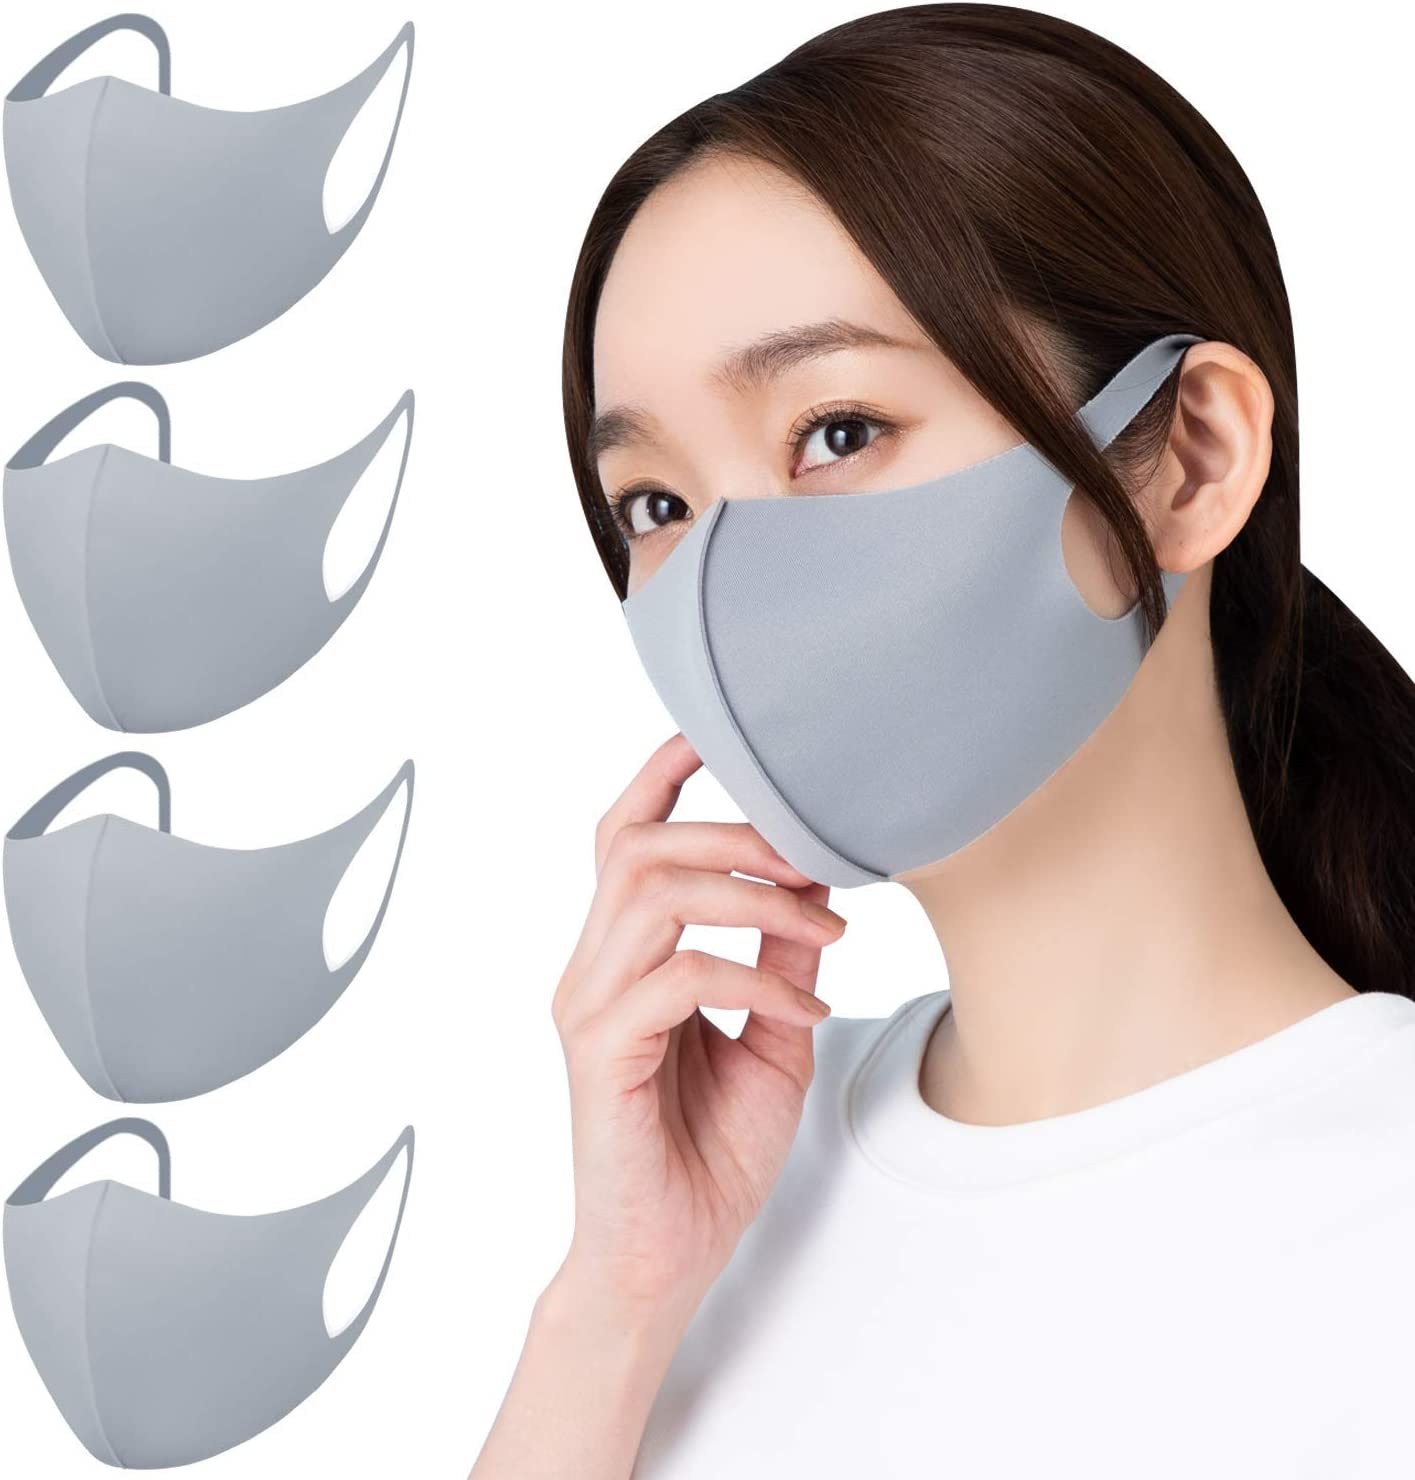 Home Cocci『マスク ひんやり 4枚組 男女兼用』